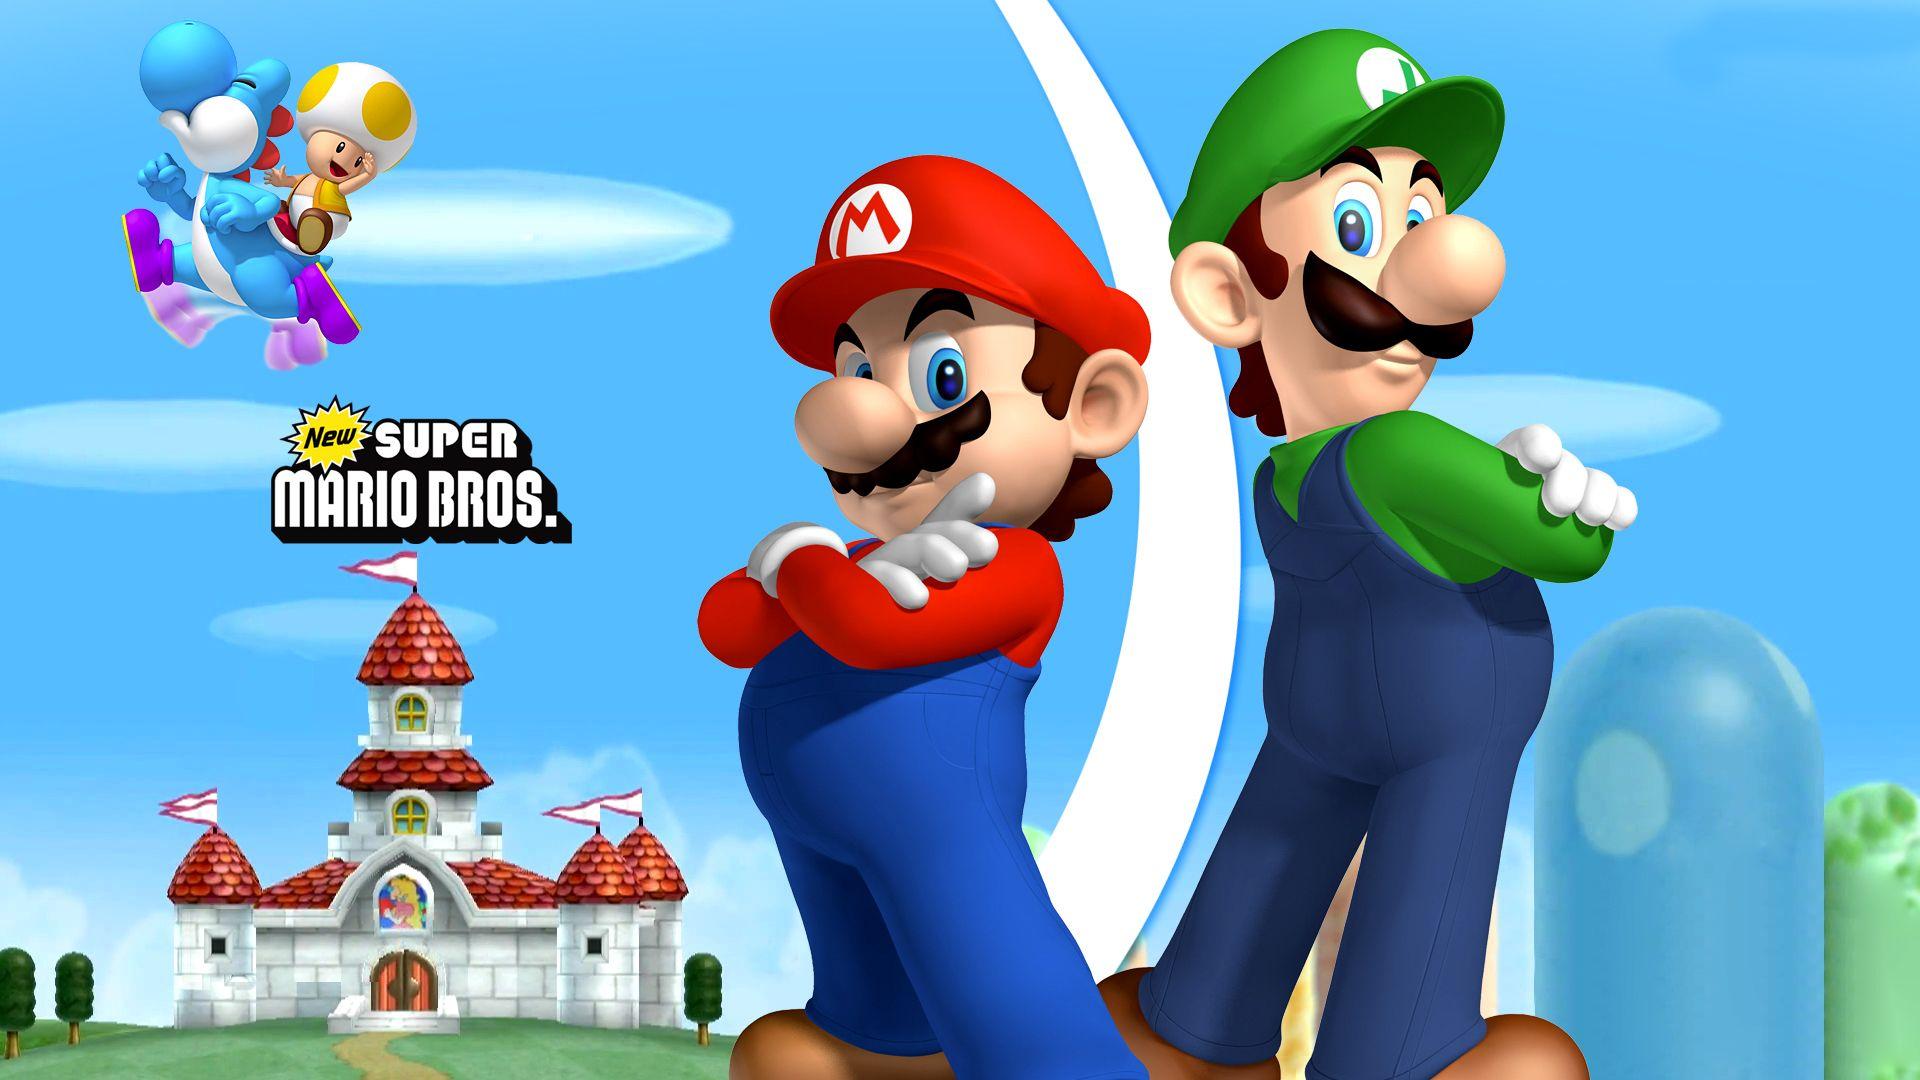 Amazing Wallpaper Logo Super Smash Bro - 63bd7d2ee6b1cb0bad3e8d9e76cdeb0a  Gallery_946293.jpg